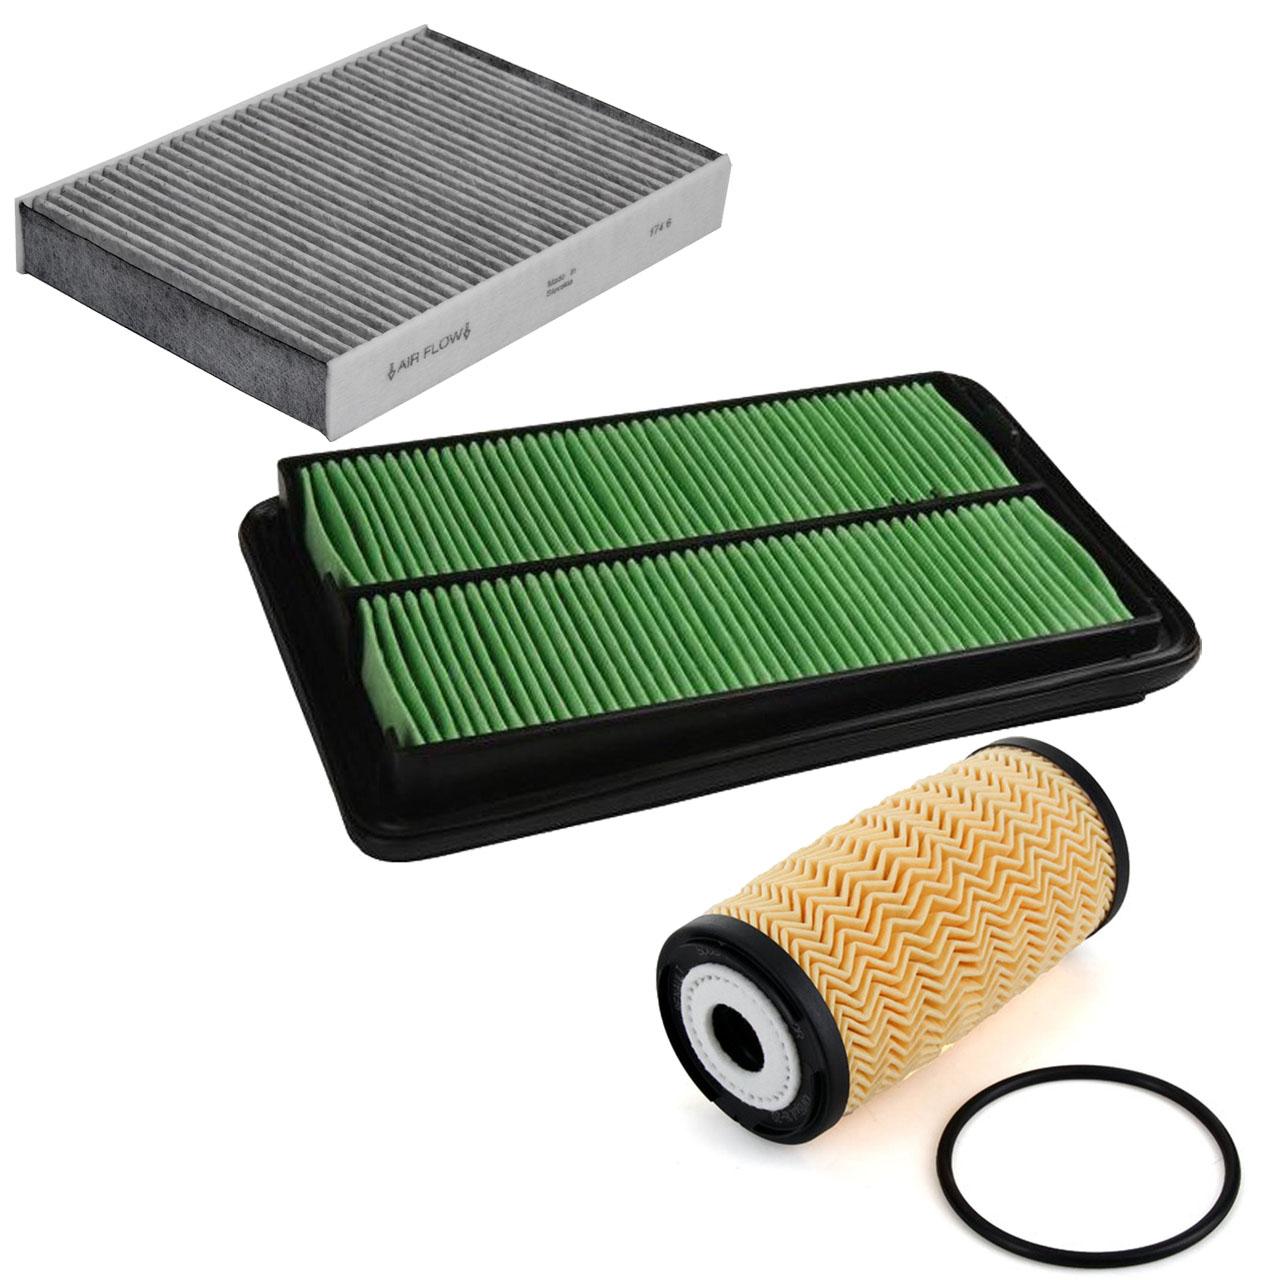 Inspektionskit Filterpaket Filterset für RENAULT KADJAR 1.6dCi 130 130 PS